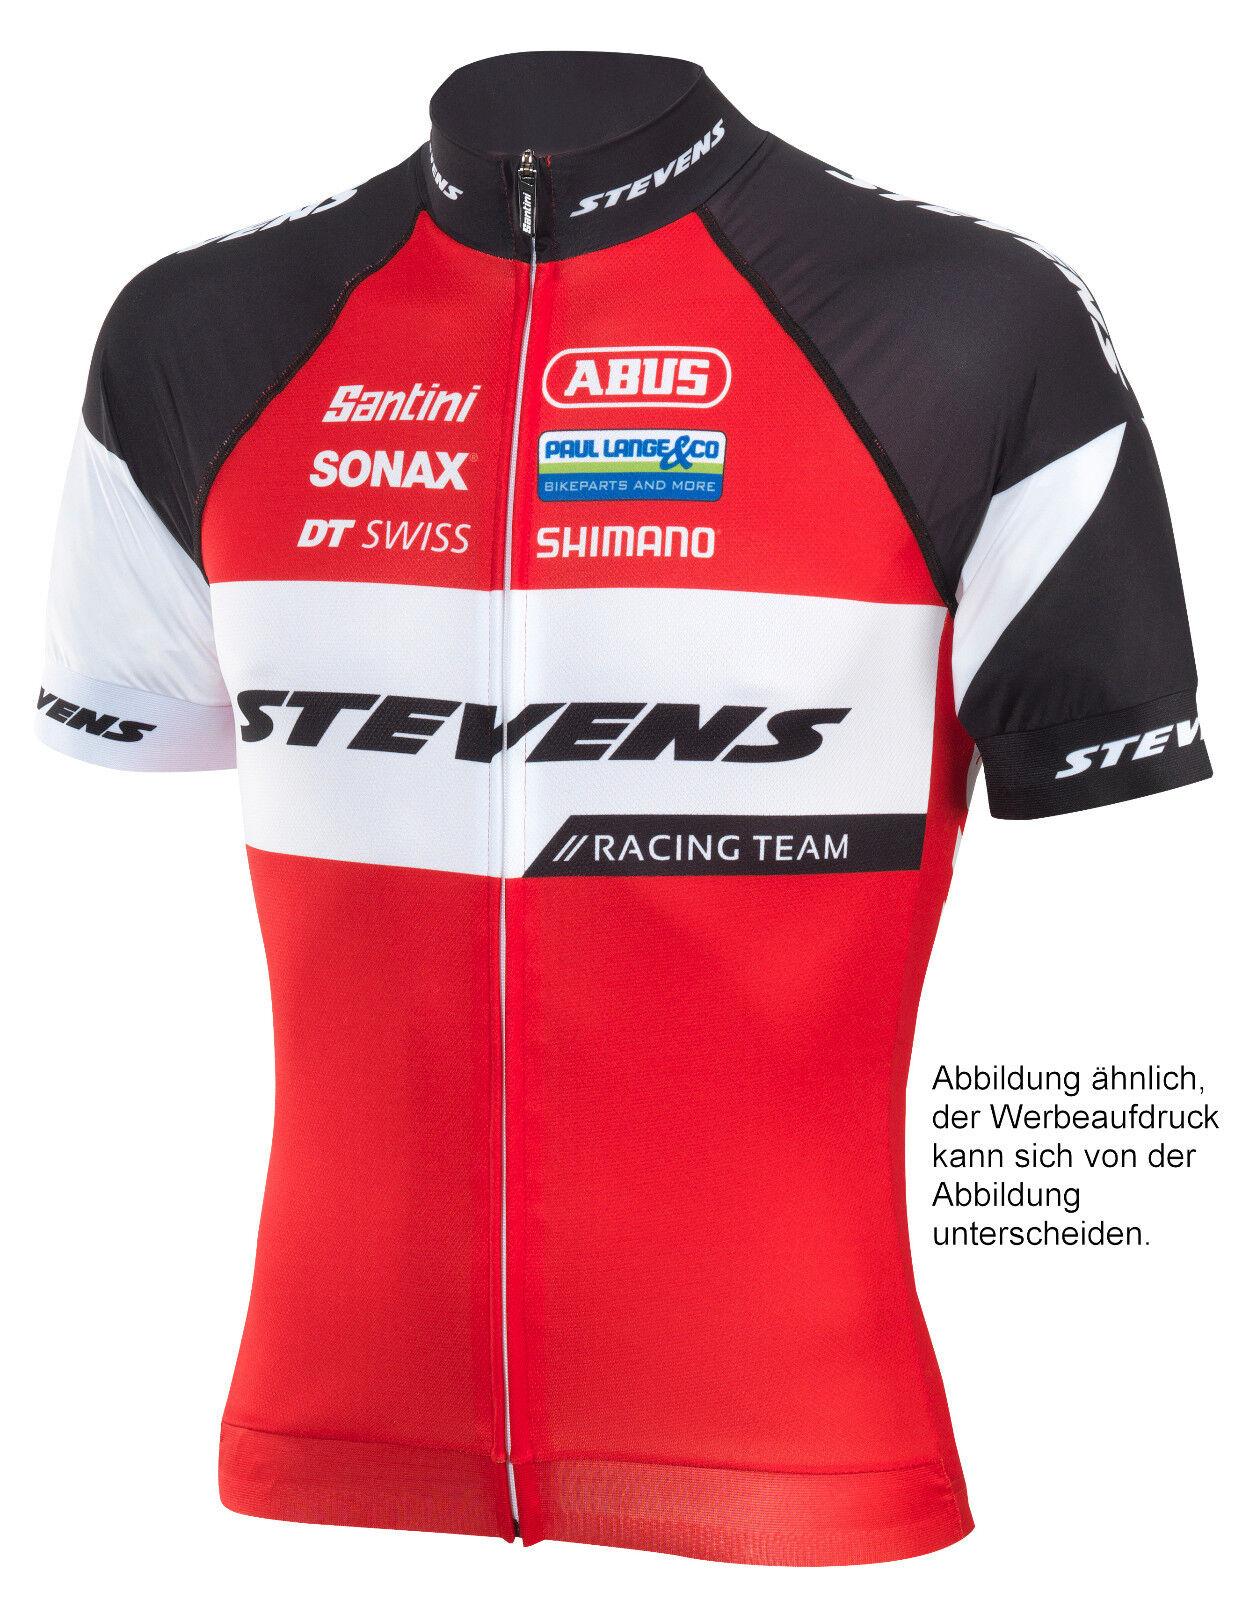 STEVENS Trikot kurzarm Racing Team 2.0 Rot Schwarz Weiss Fahrrad Fahrrad Weiss Gr. XXL RADWELT 81b081